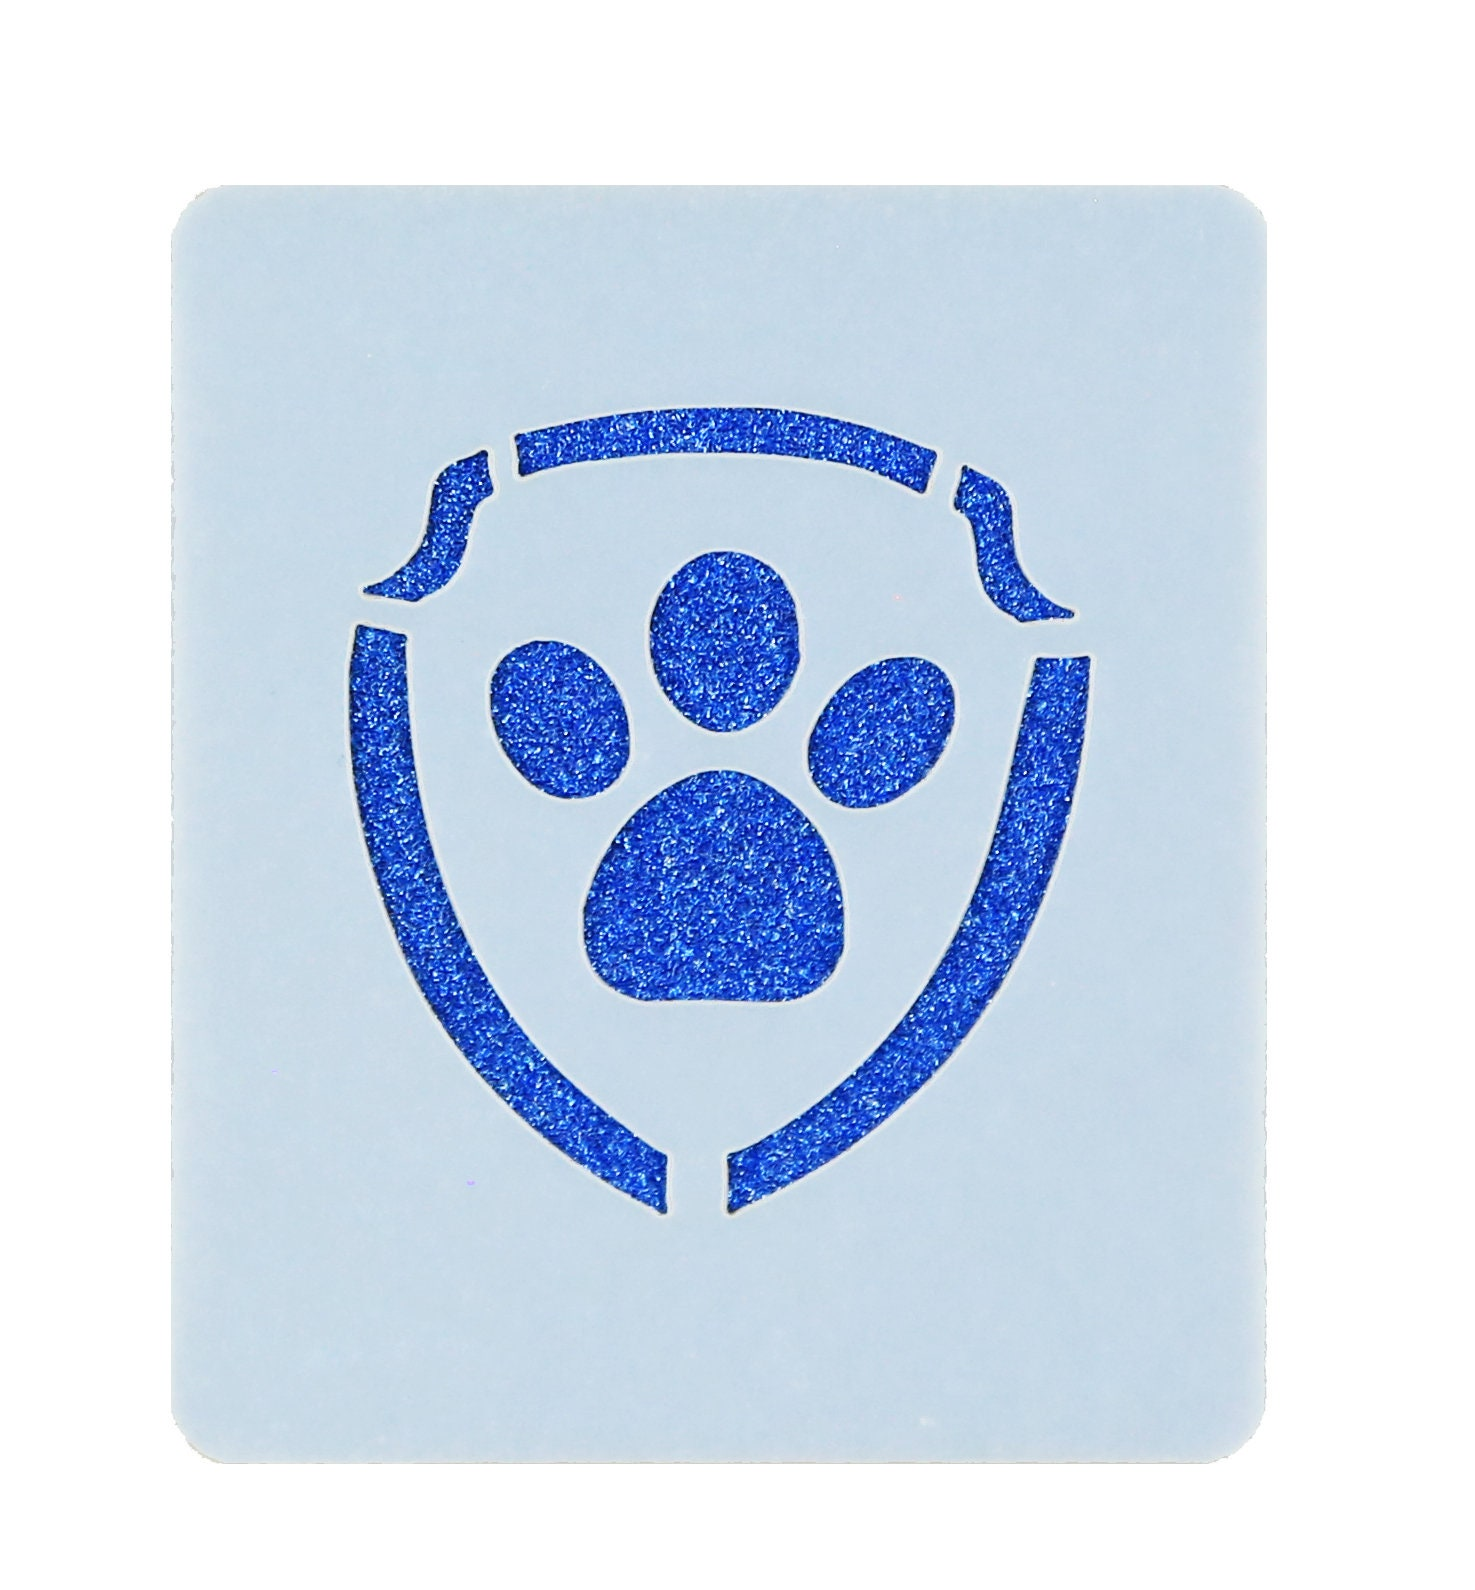 paw patrol logo face painting stencil 7cm x 6cm washable. Black Bedroom Furniture Sets. Home Design Ideas